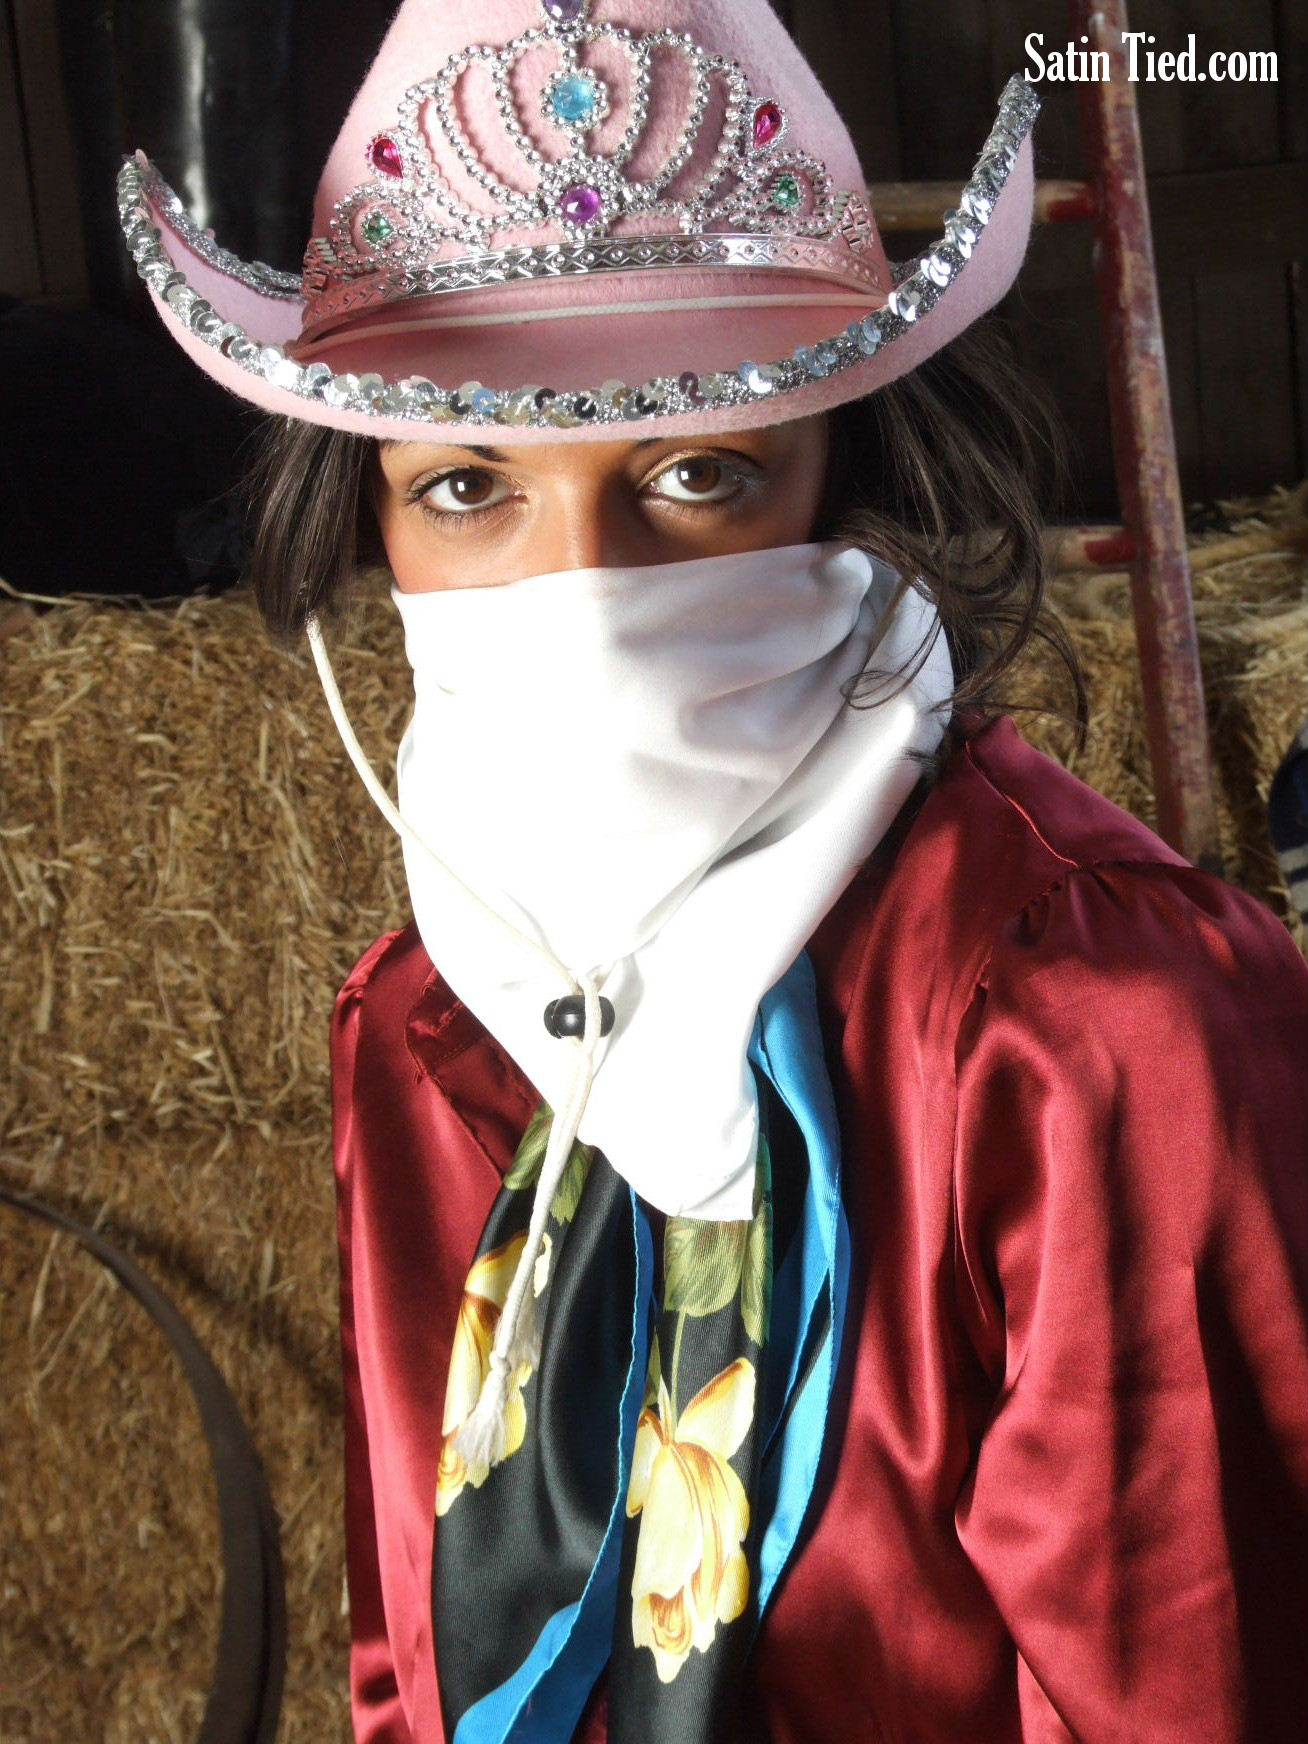 Satin Tied: Masked in Satin